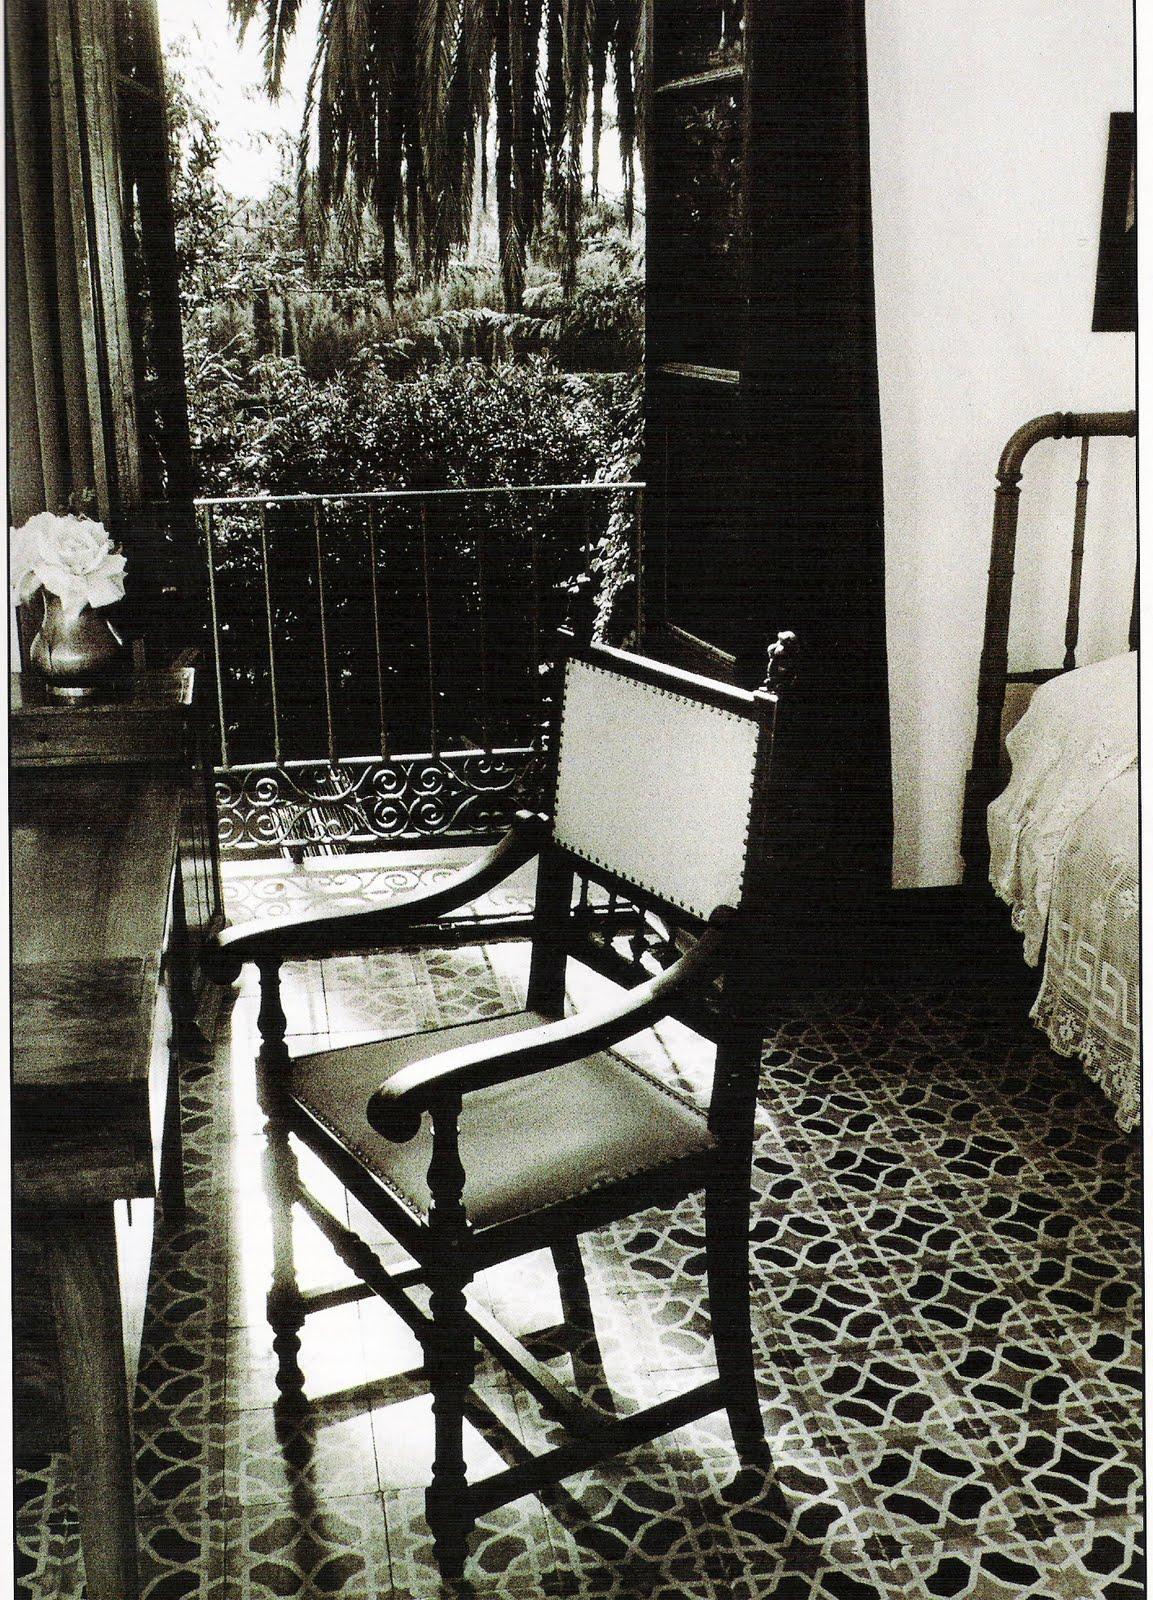 Huerta de san vicente muebles dise os arquitect nicos for Muebles de oficina lorca